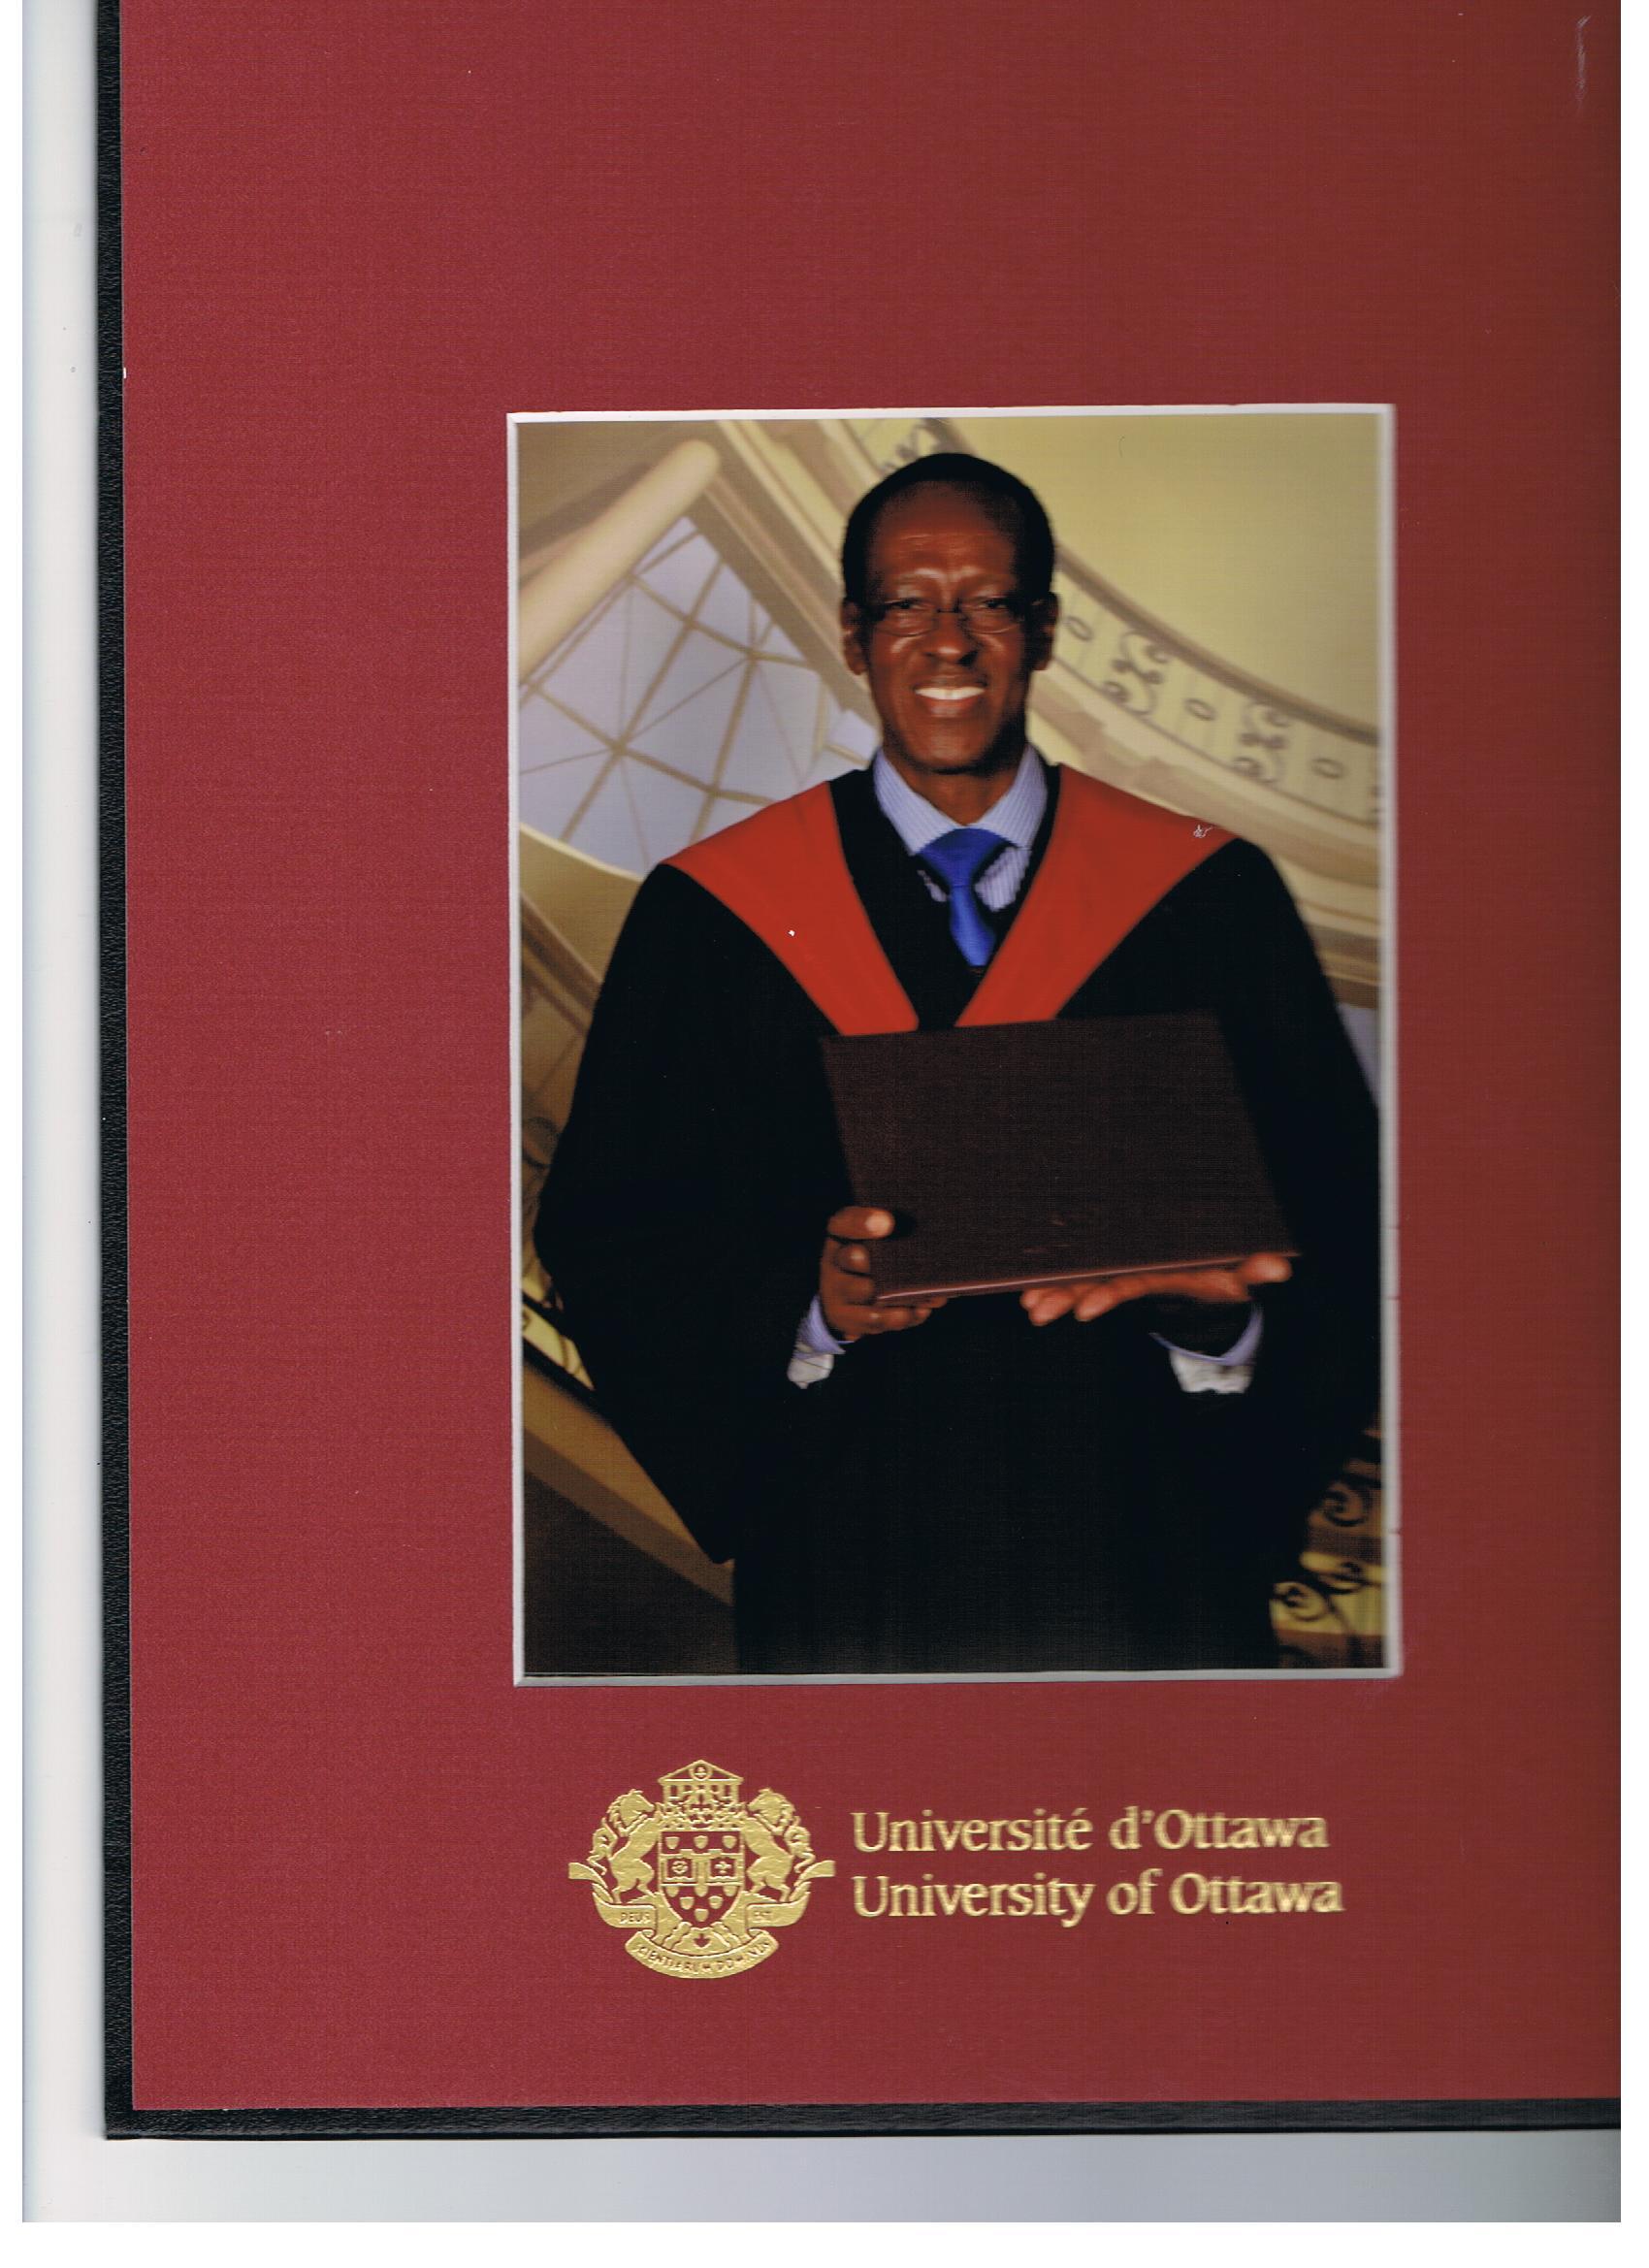 Professeur Jean-Bosco IYAKAREMYE